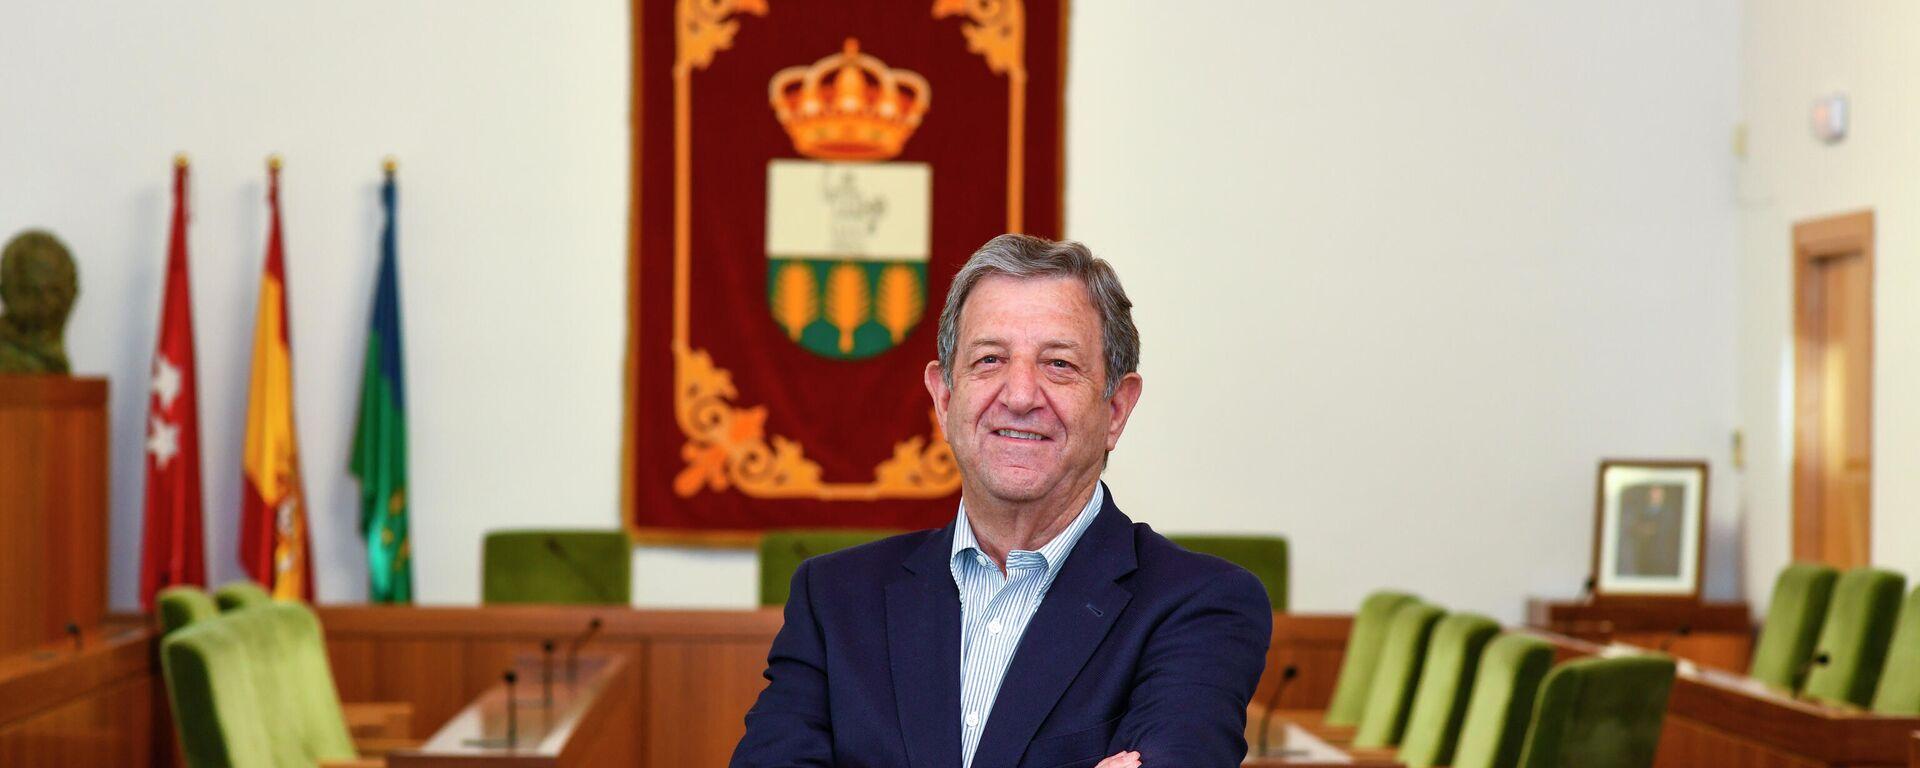 Luis Partida, alcalde de Villanueva de la Cañada, Madrid - Sputnik Mundo, 1920, 28.04.2021